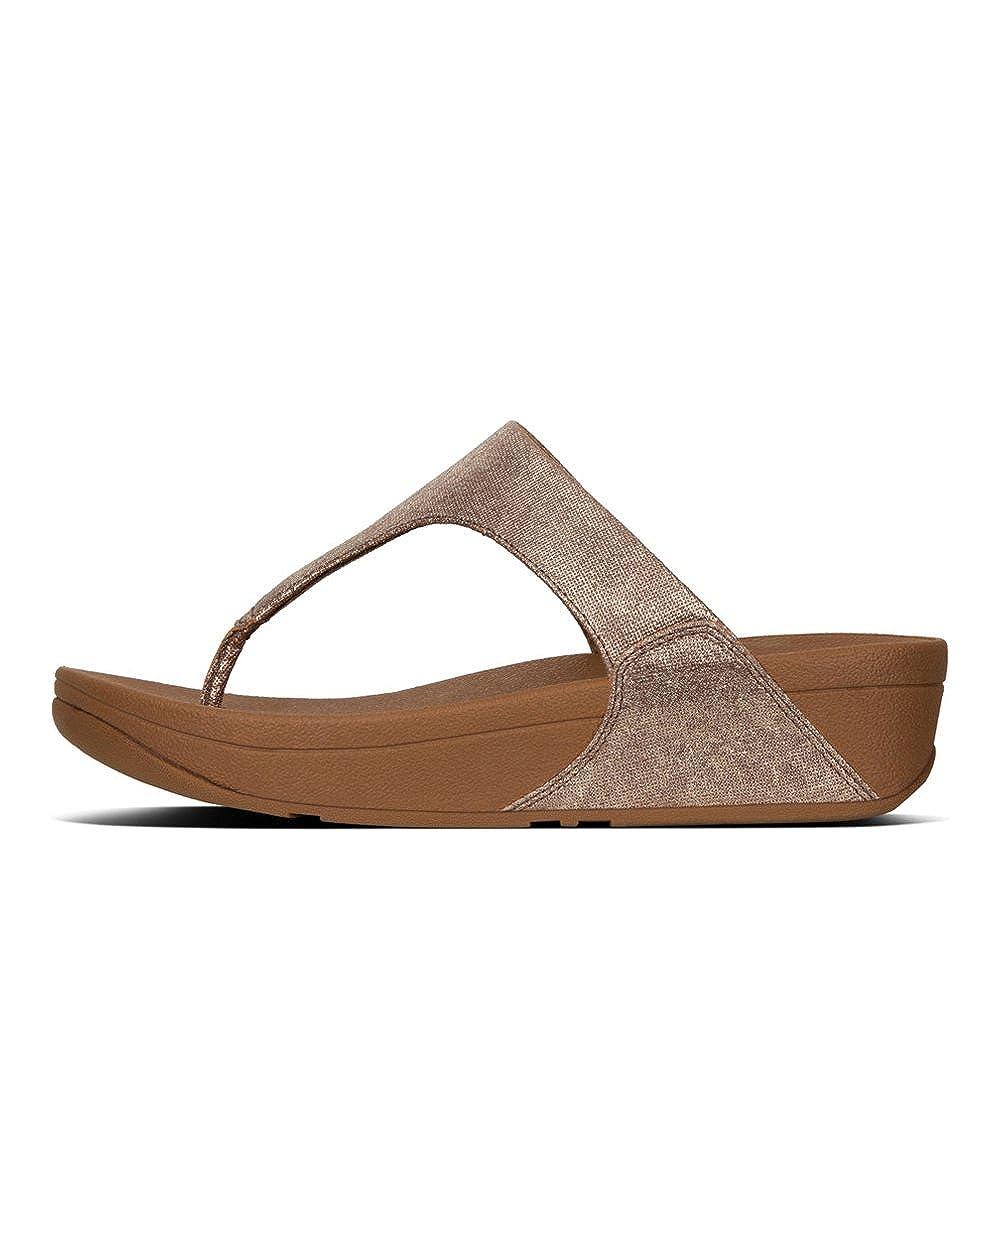 8c6ae7e4dde362 Fitflop Women s s Shimmy Toe-Thong Sandals - FOIL Print Suede Platform